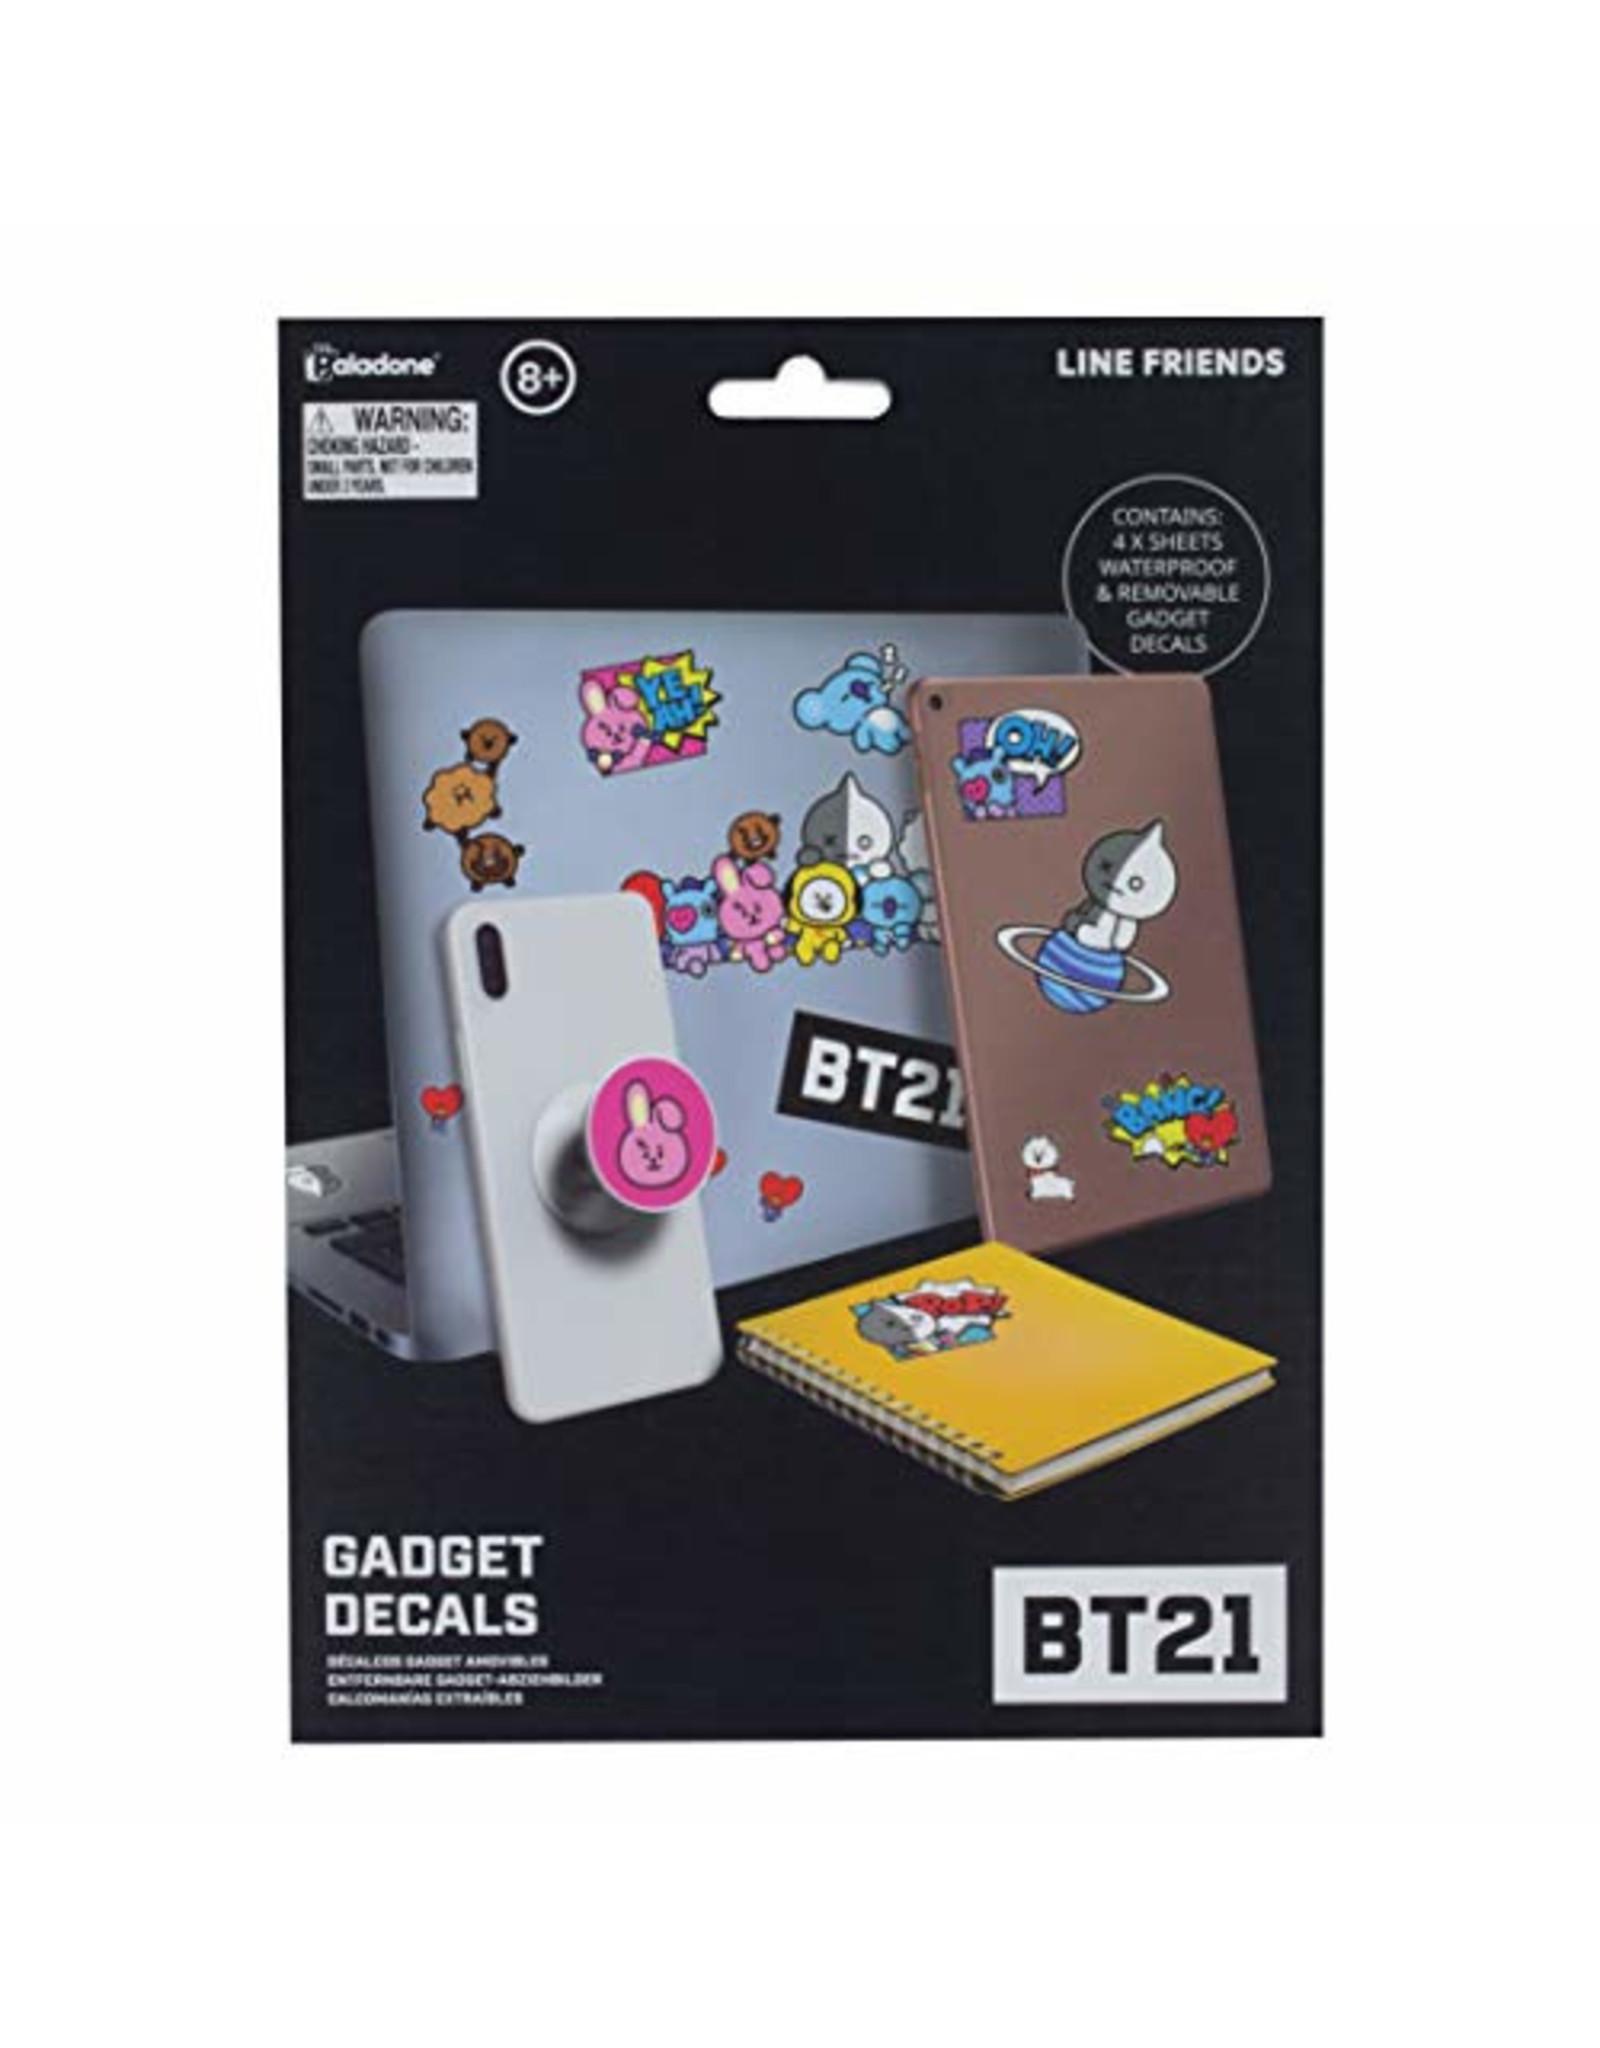 BT21 - Gadget Decals